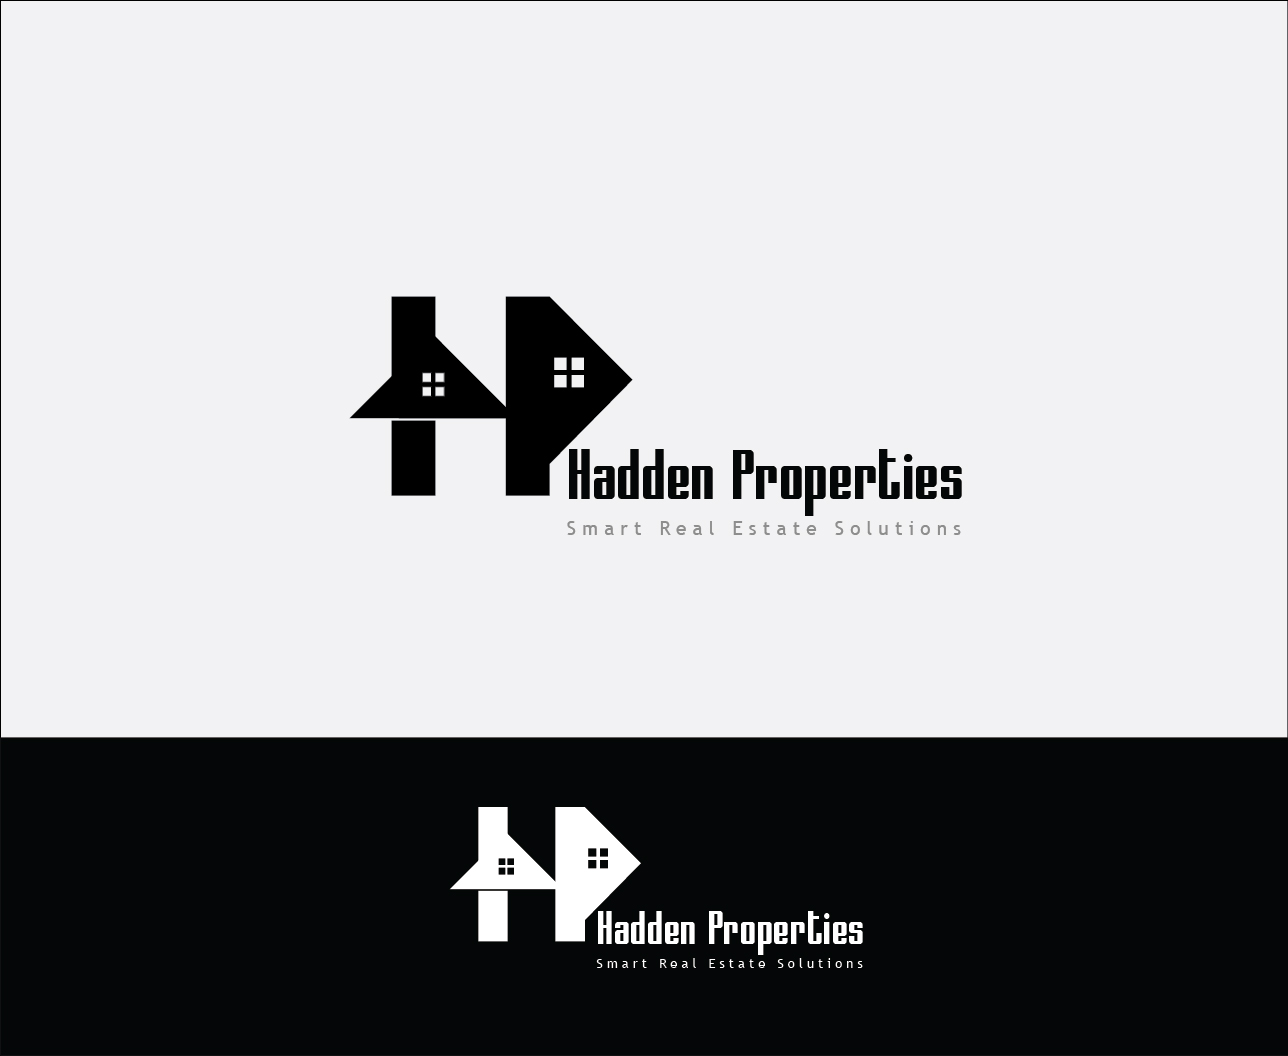 Logo Design by Derel Valarian - Entry No. 117 in the Logo Design Contest Artistic Logo Design for Hadden Properties.